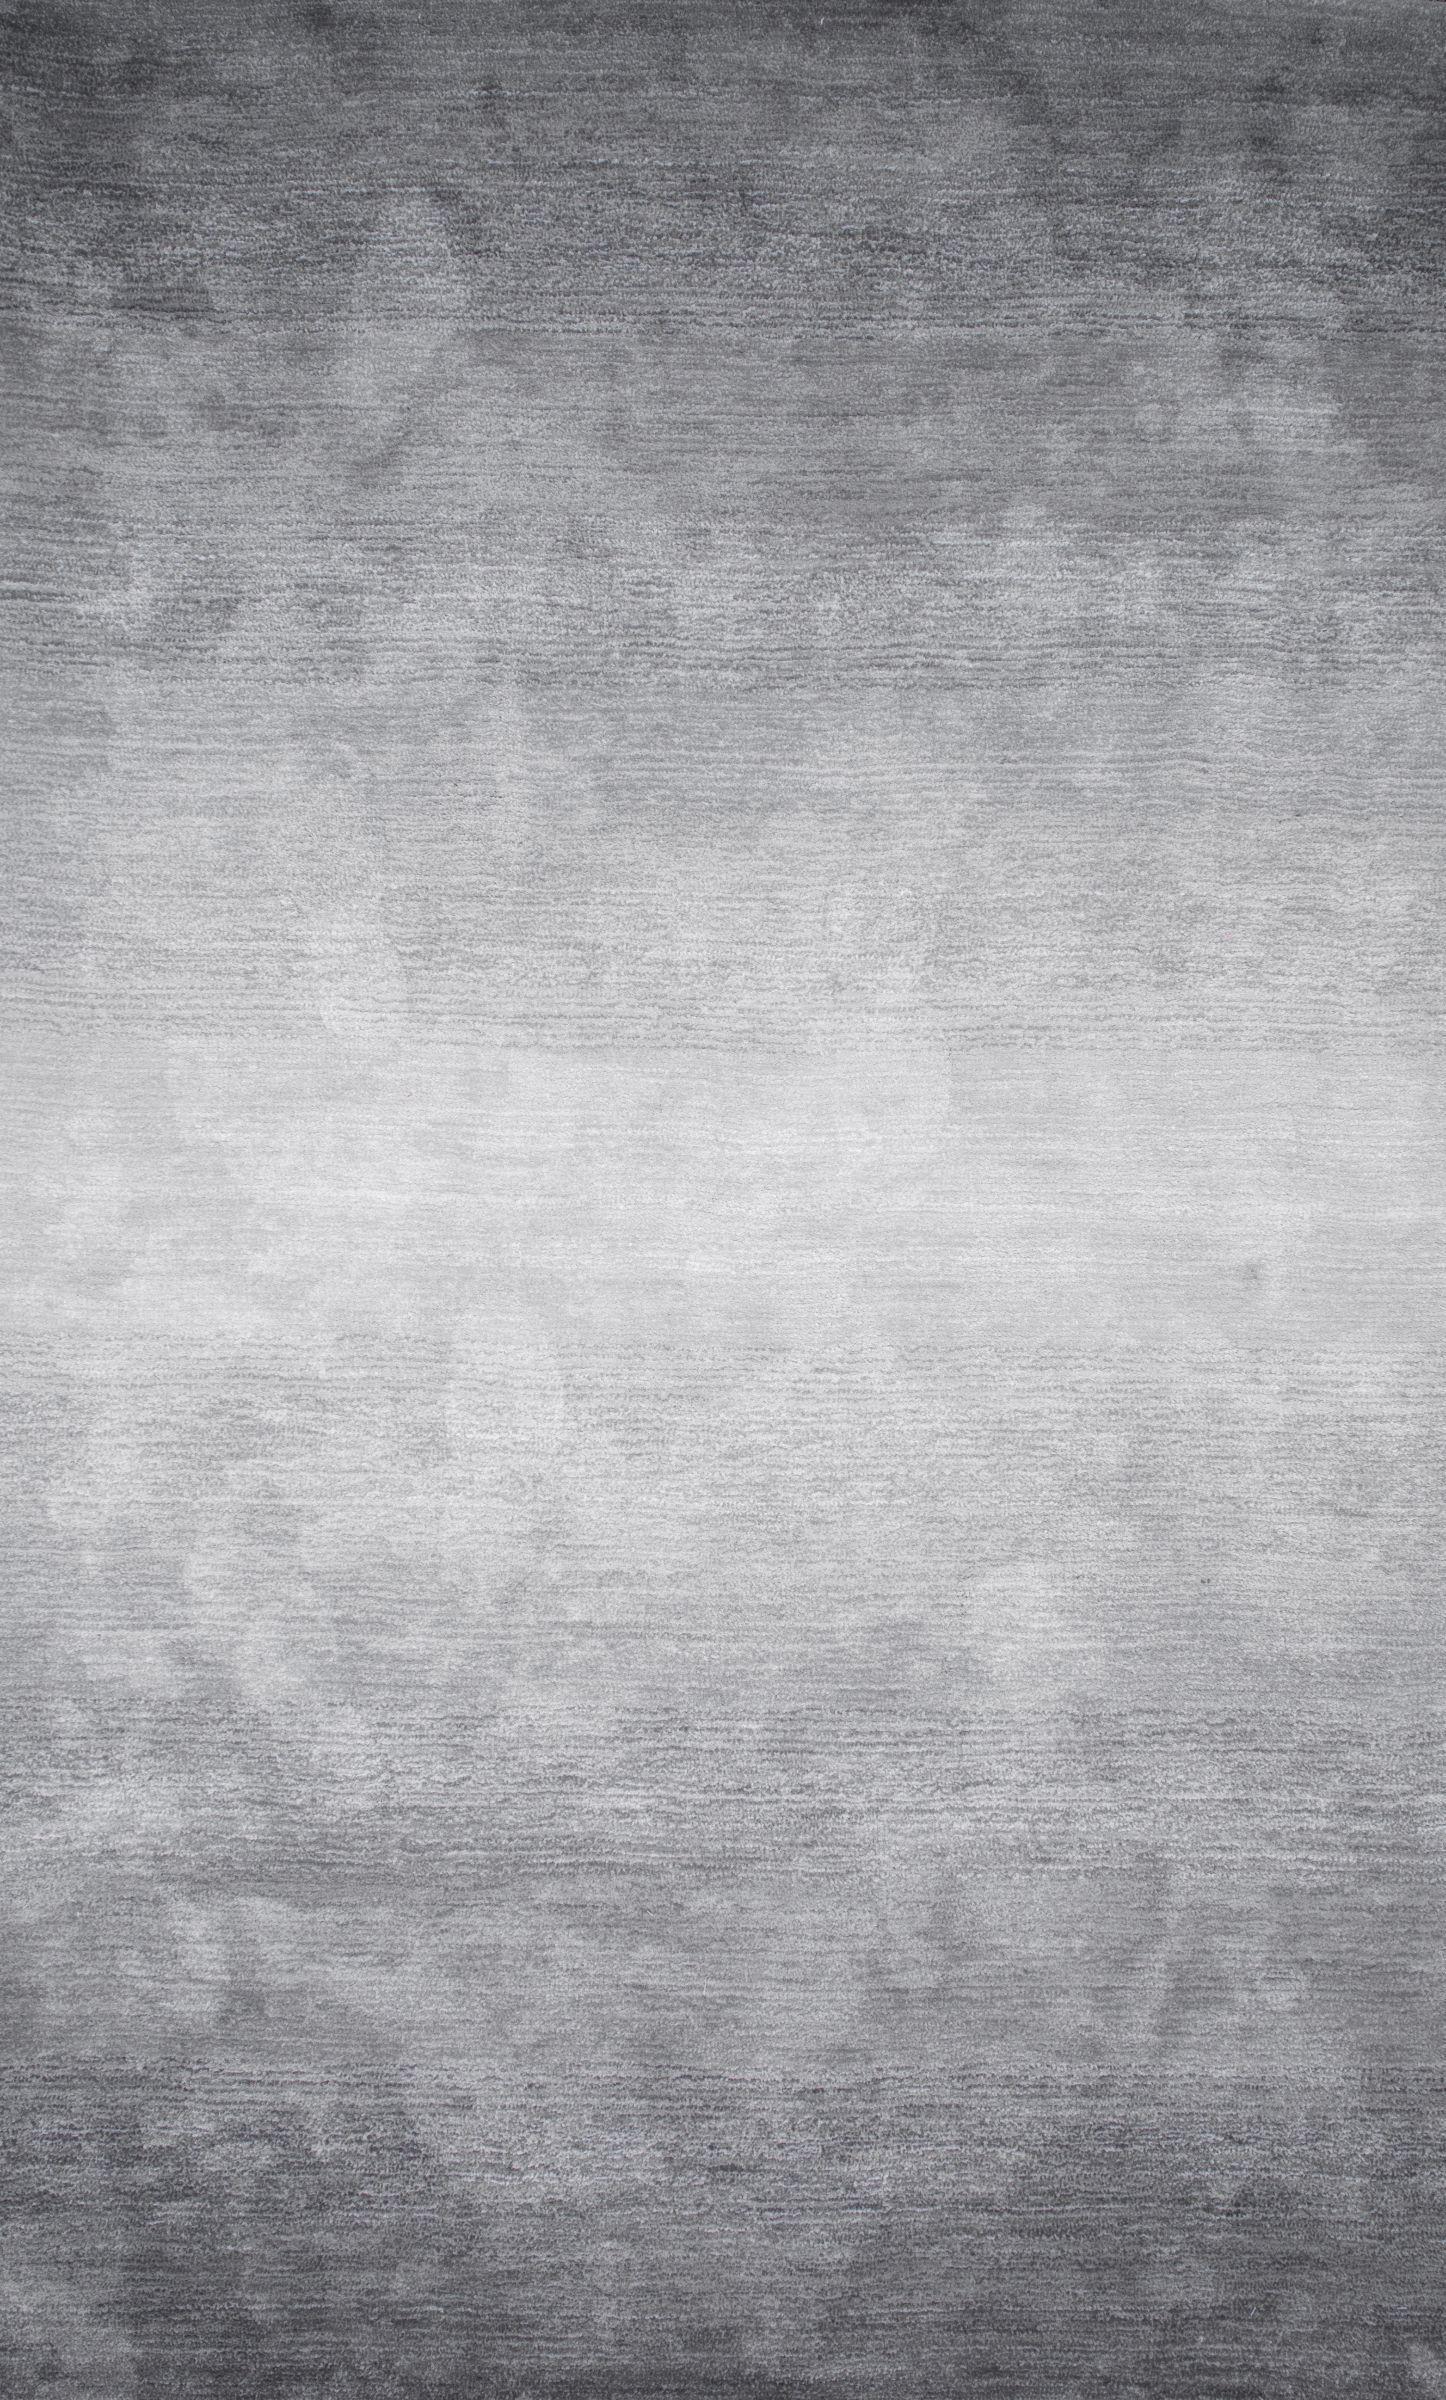 Deskins Hand-Tufted Gray Area Rug Rug Size: Rectangle 8'6